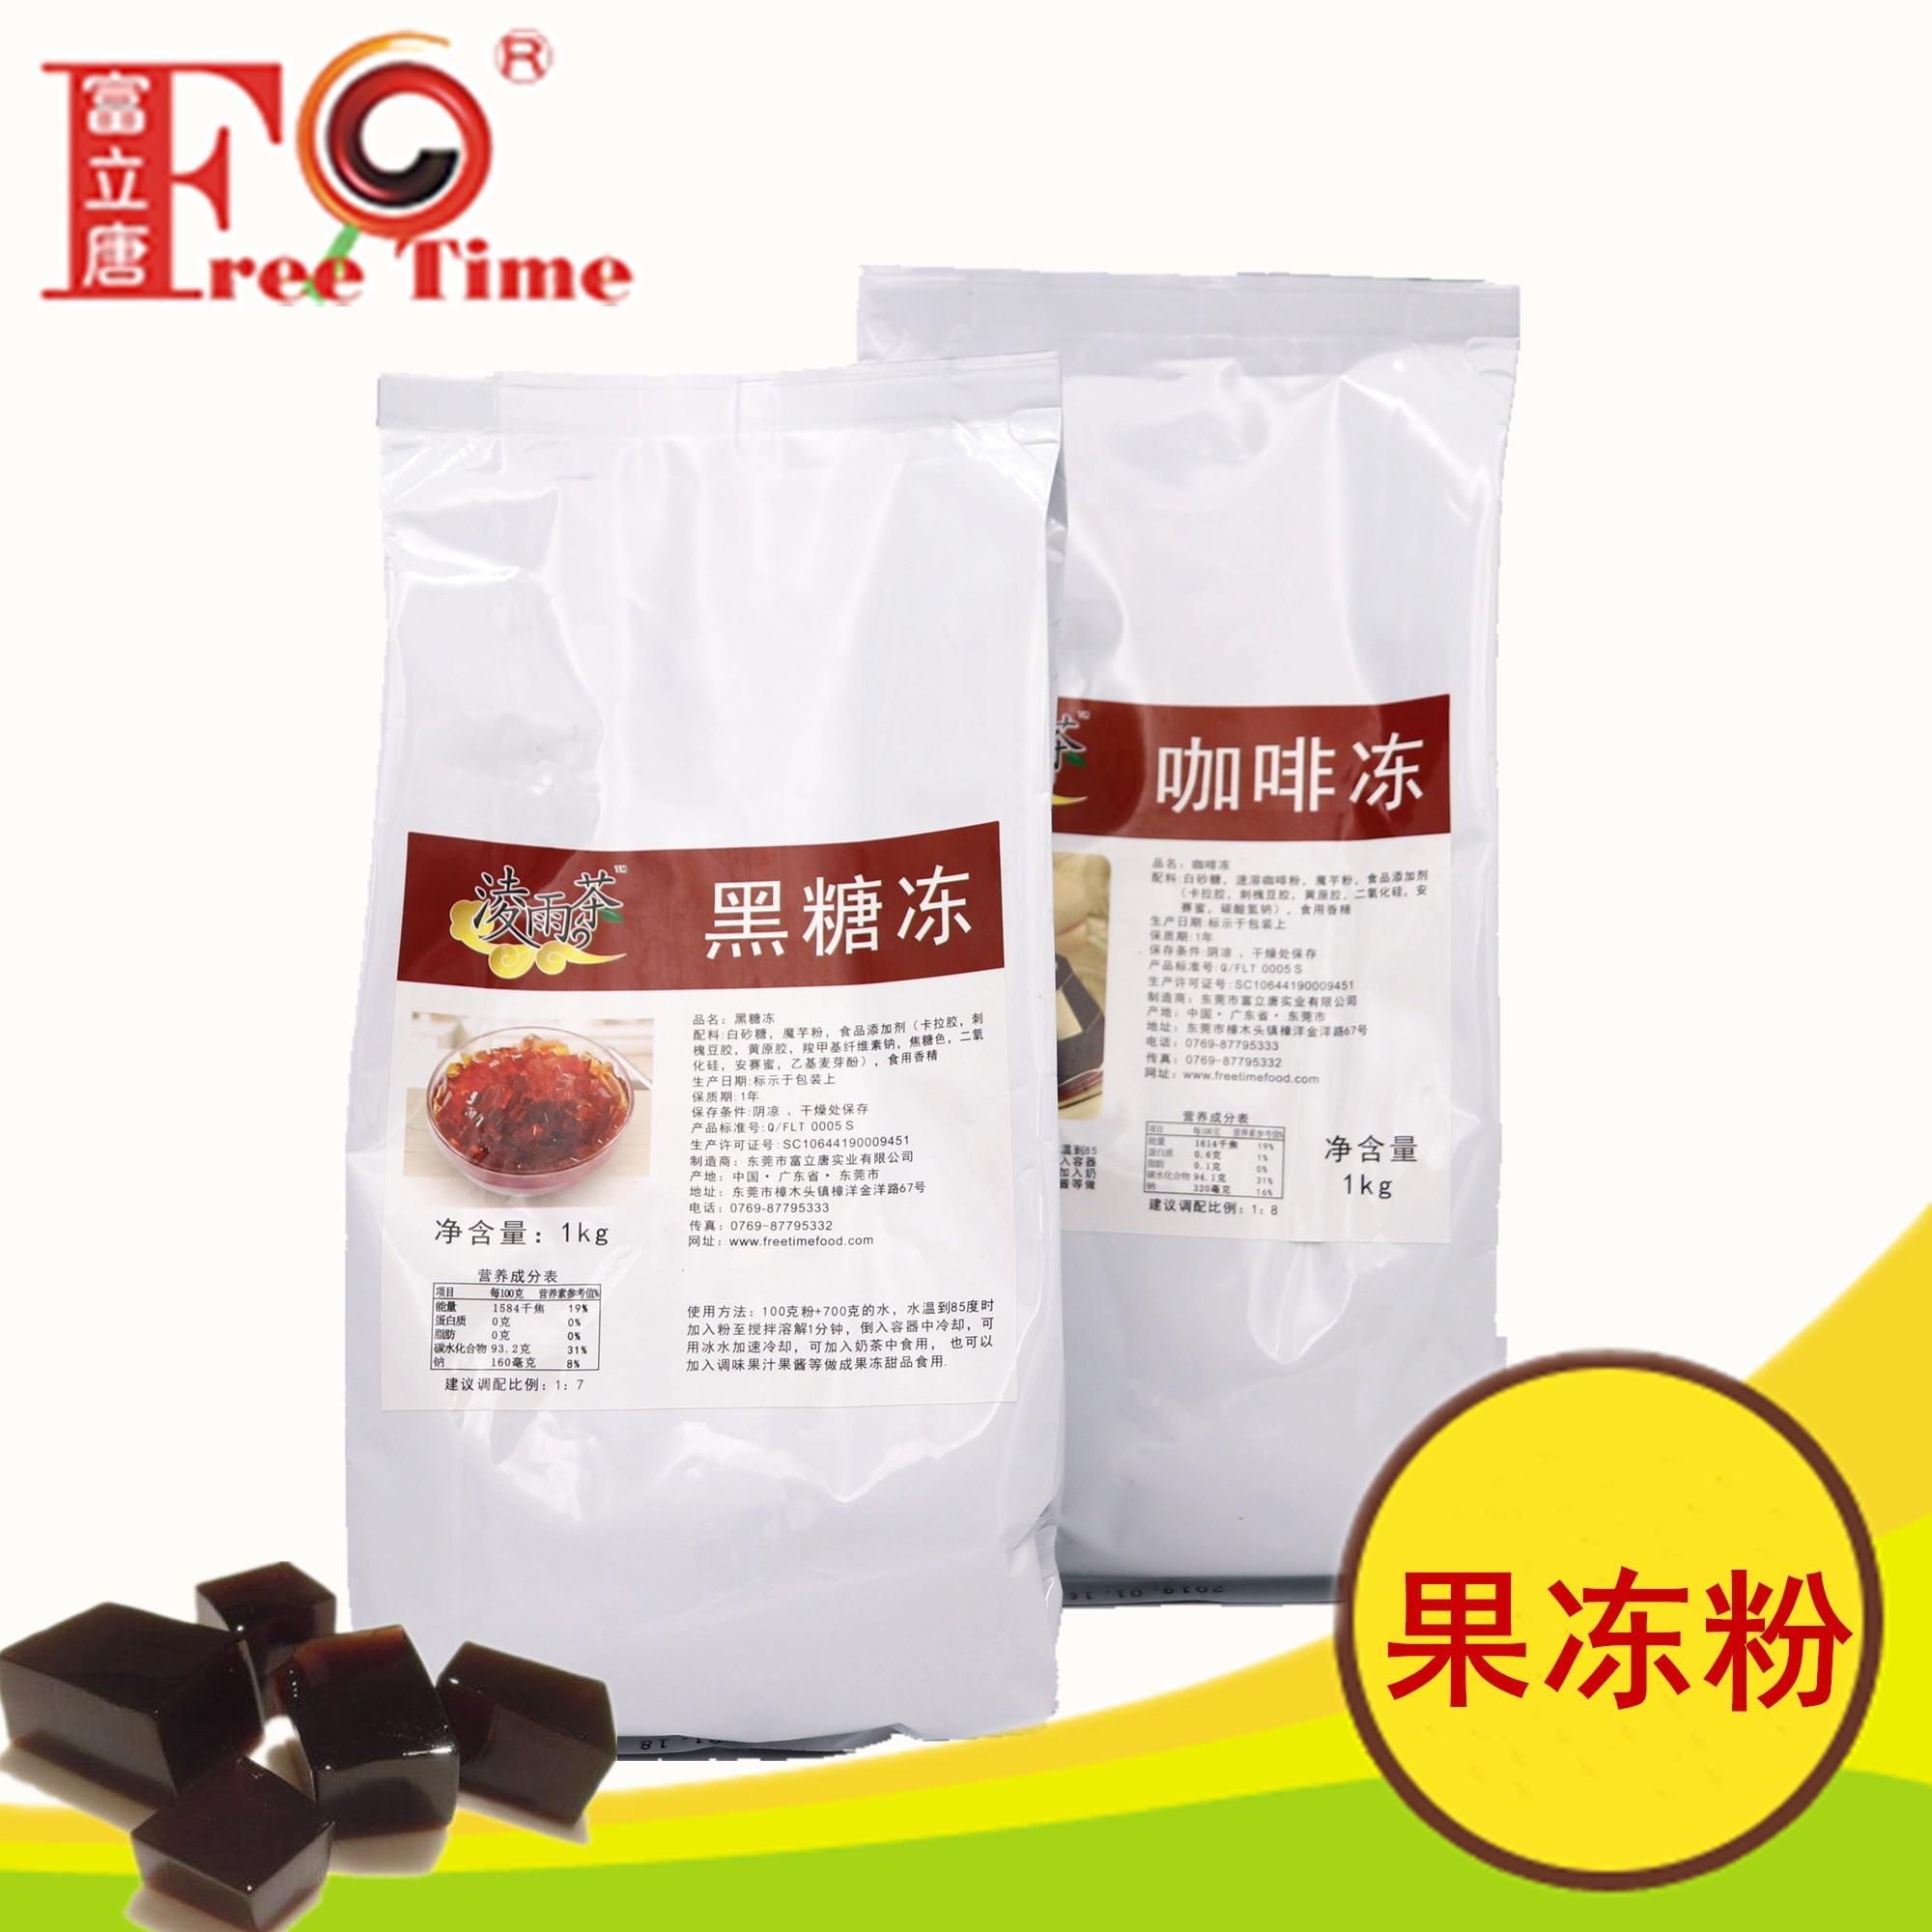 Fuli tanglingyu tea black sugar jelly powder coffee jelly powder net red bit jelly pudding powder milk tea raw material two Jin